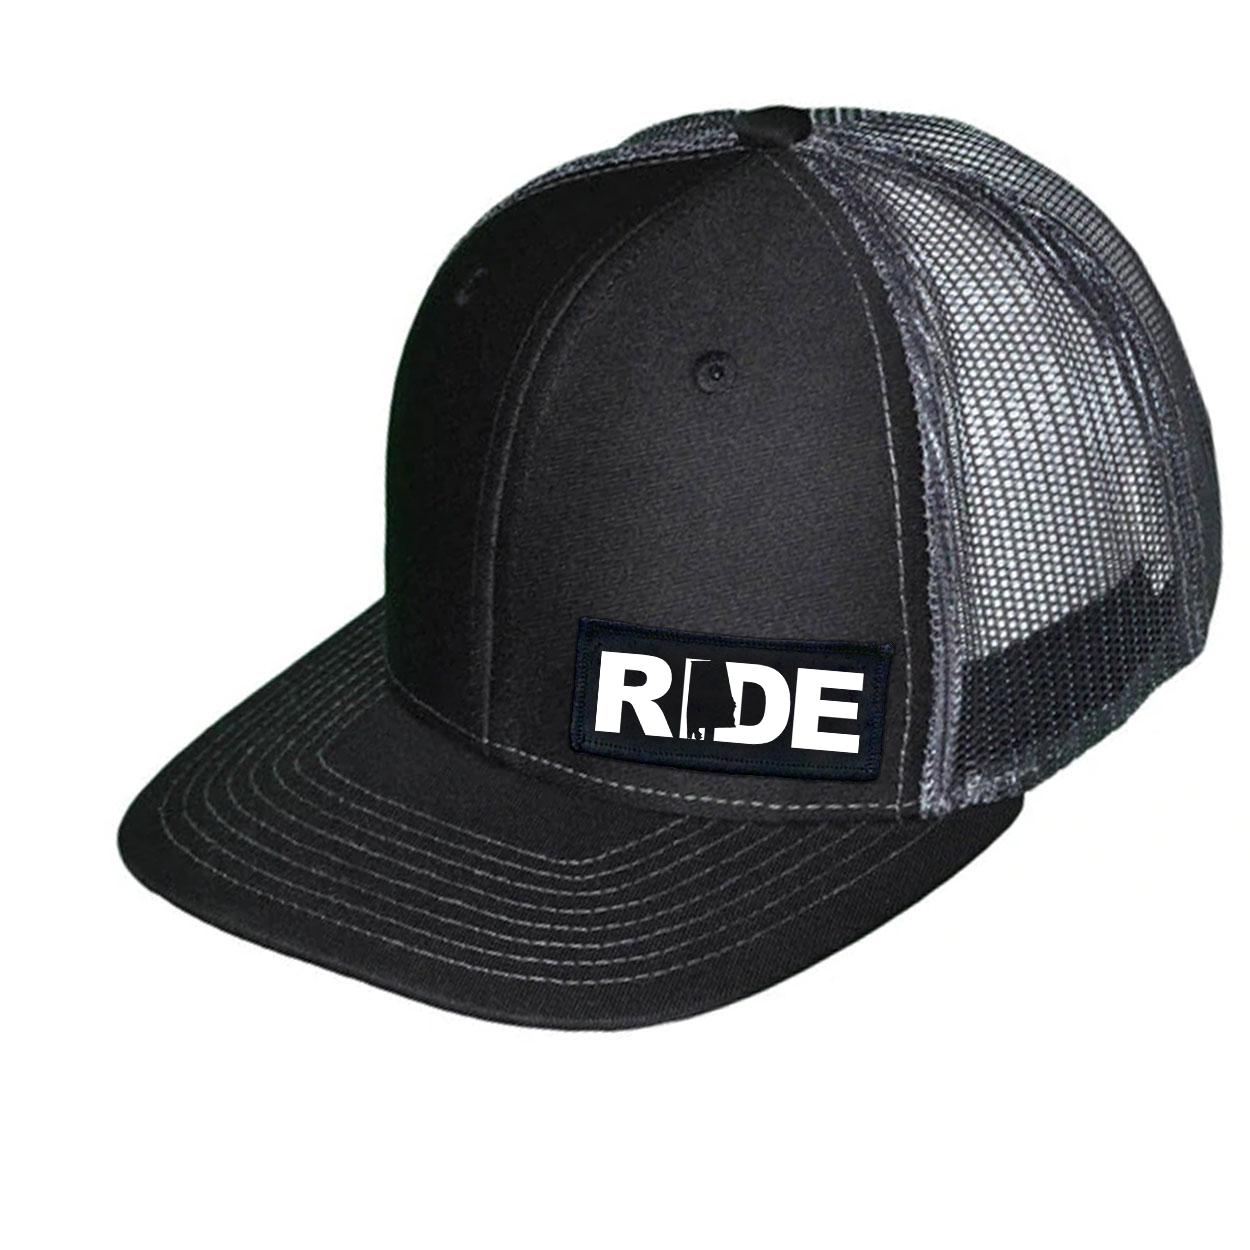 Ride Alabama Night Out Woven Patch Snapback Trucker Hat Black/Dark Gray (White Logo)